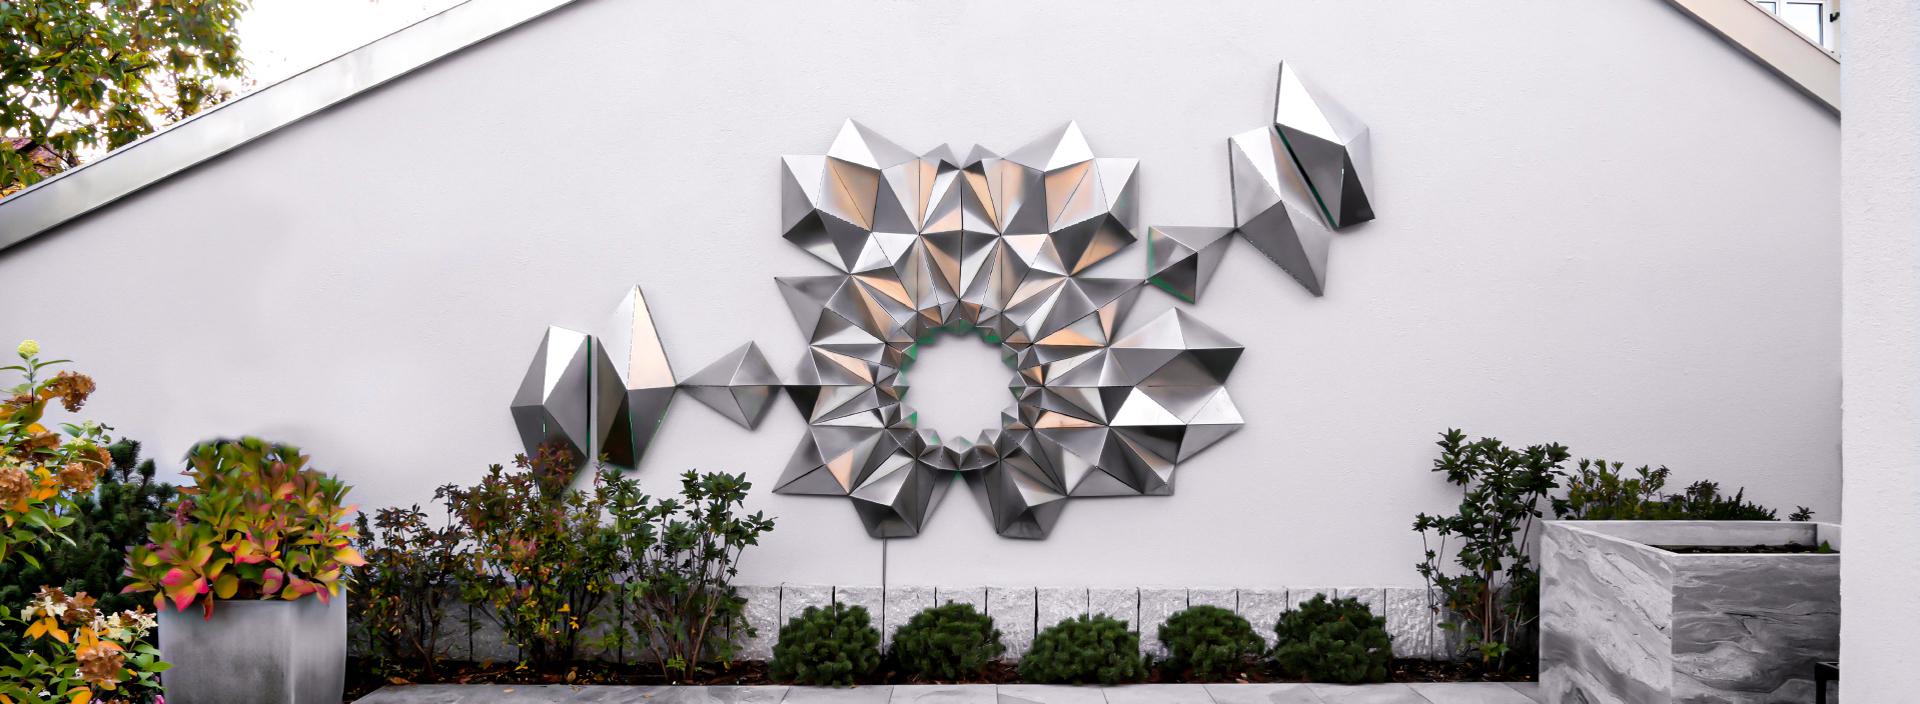 Sacrea Produkt-Bild: geometric